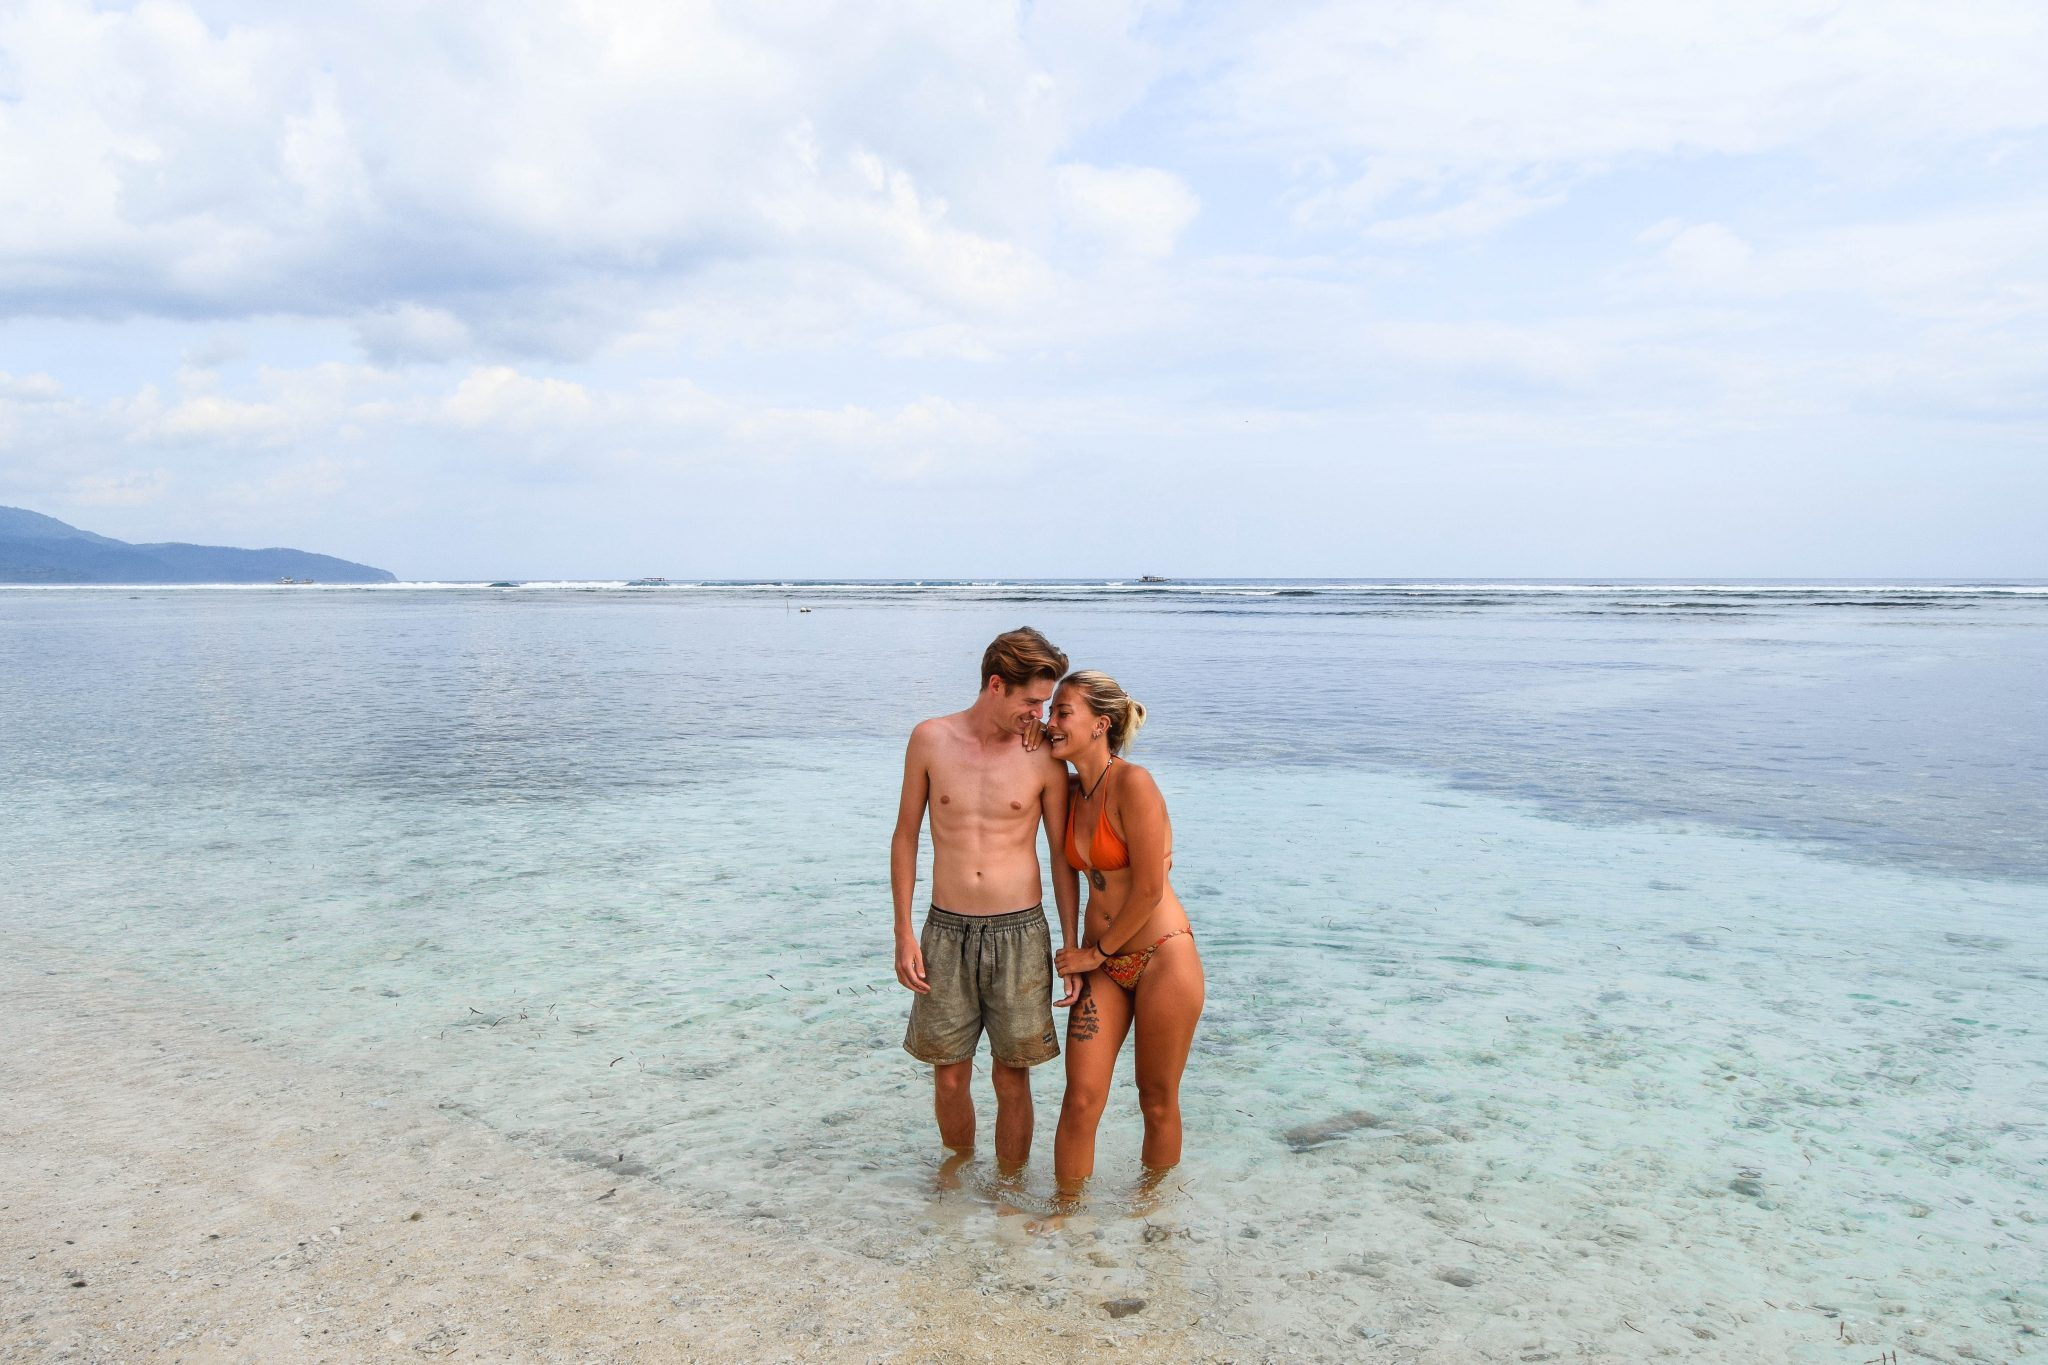 Wanderers & Warriors - Charlie & Lauren UK Travel Couple - Things To Do On Gili Trawangan - things to do gili islands